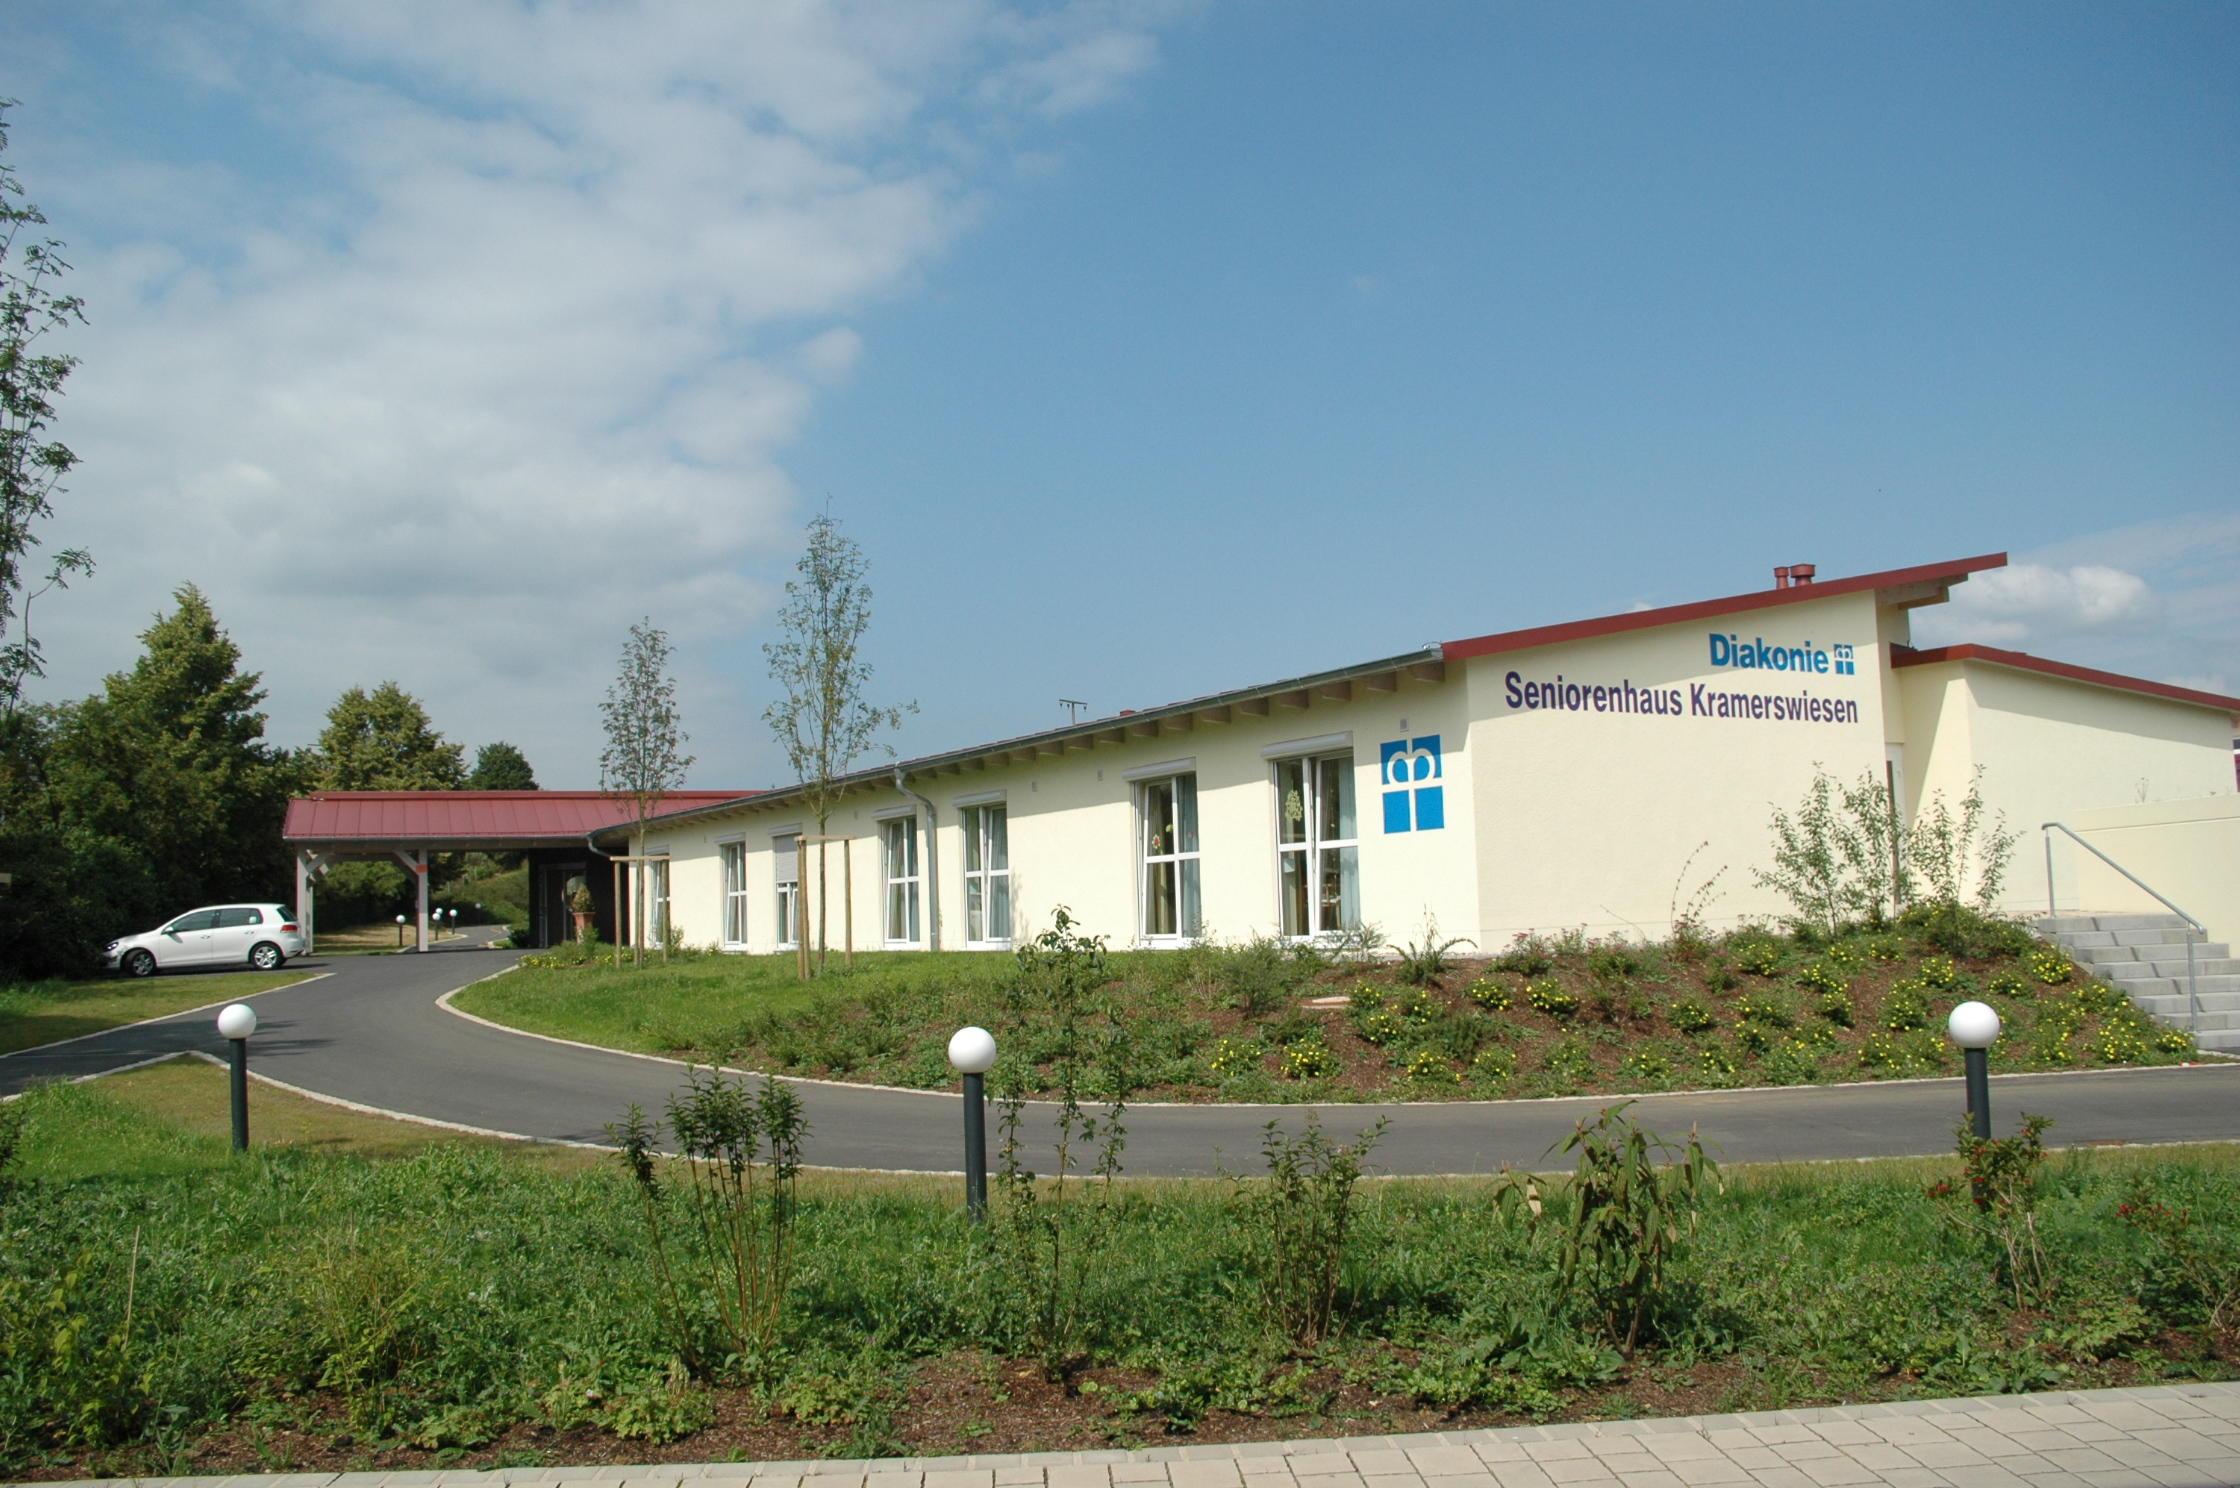 Diakonie Seniorenhaus Kramerswiesen